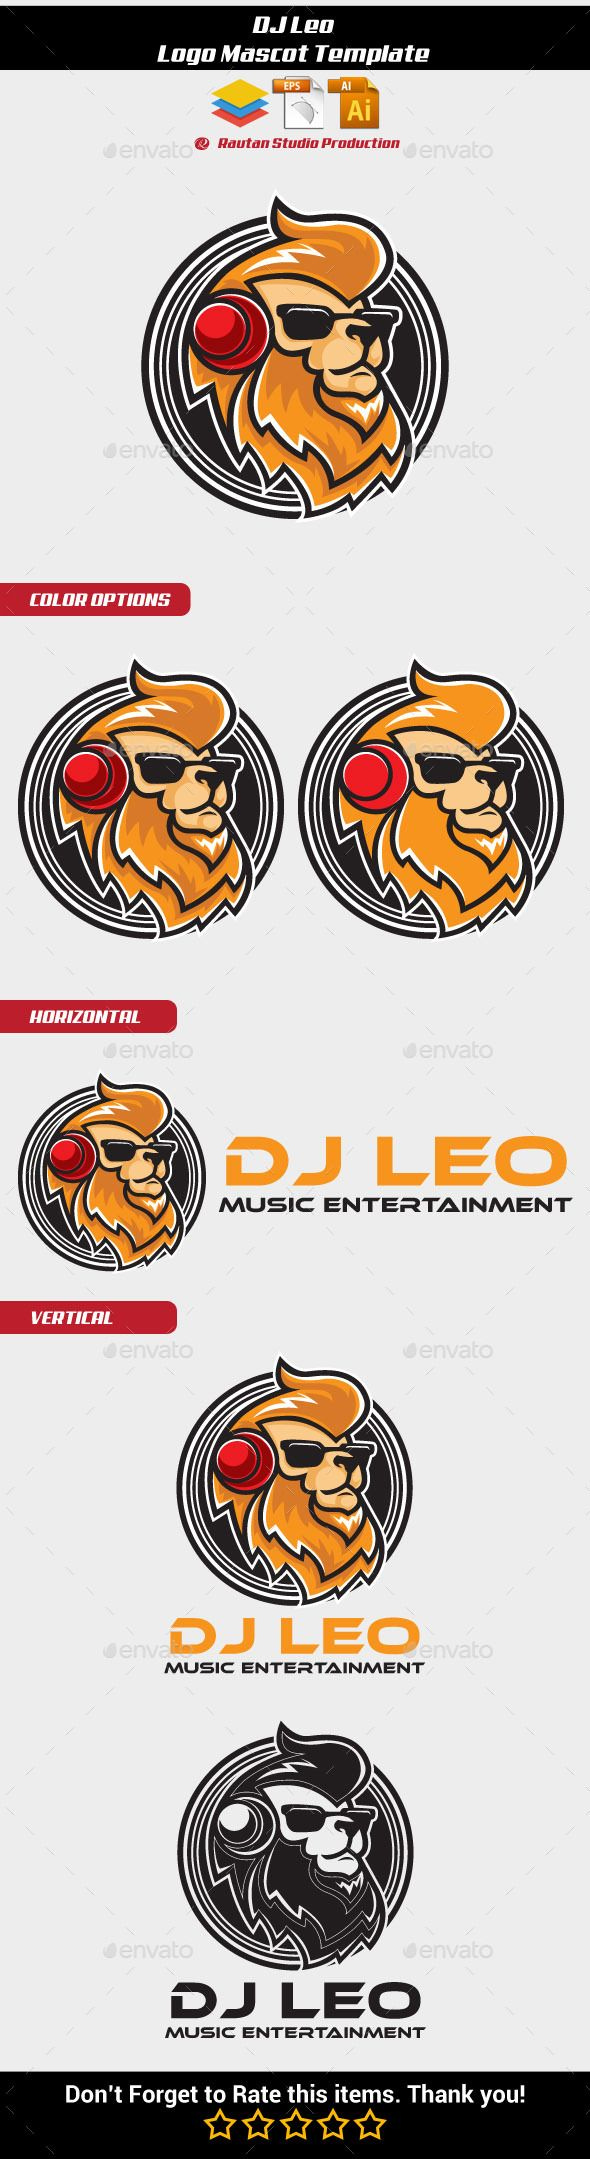 Dj Leo Logo Mascot   Pinterest   Logos, Dj logo and Logo templates